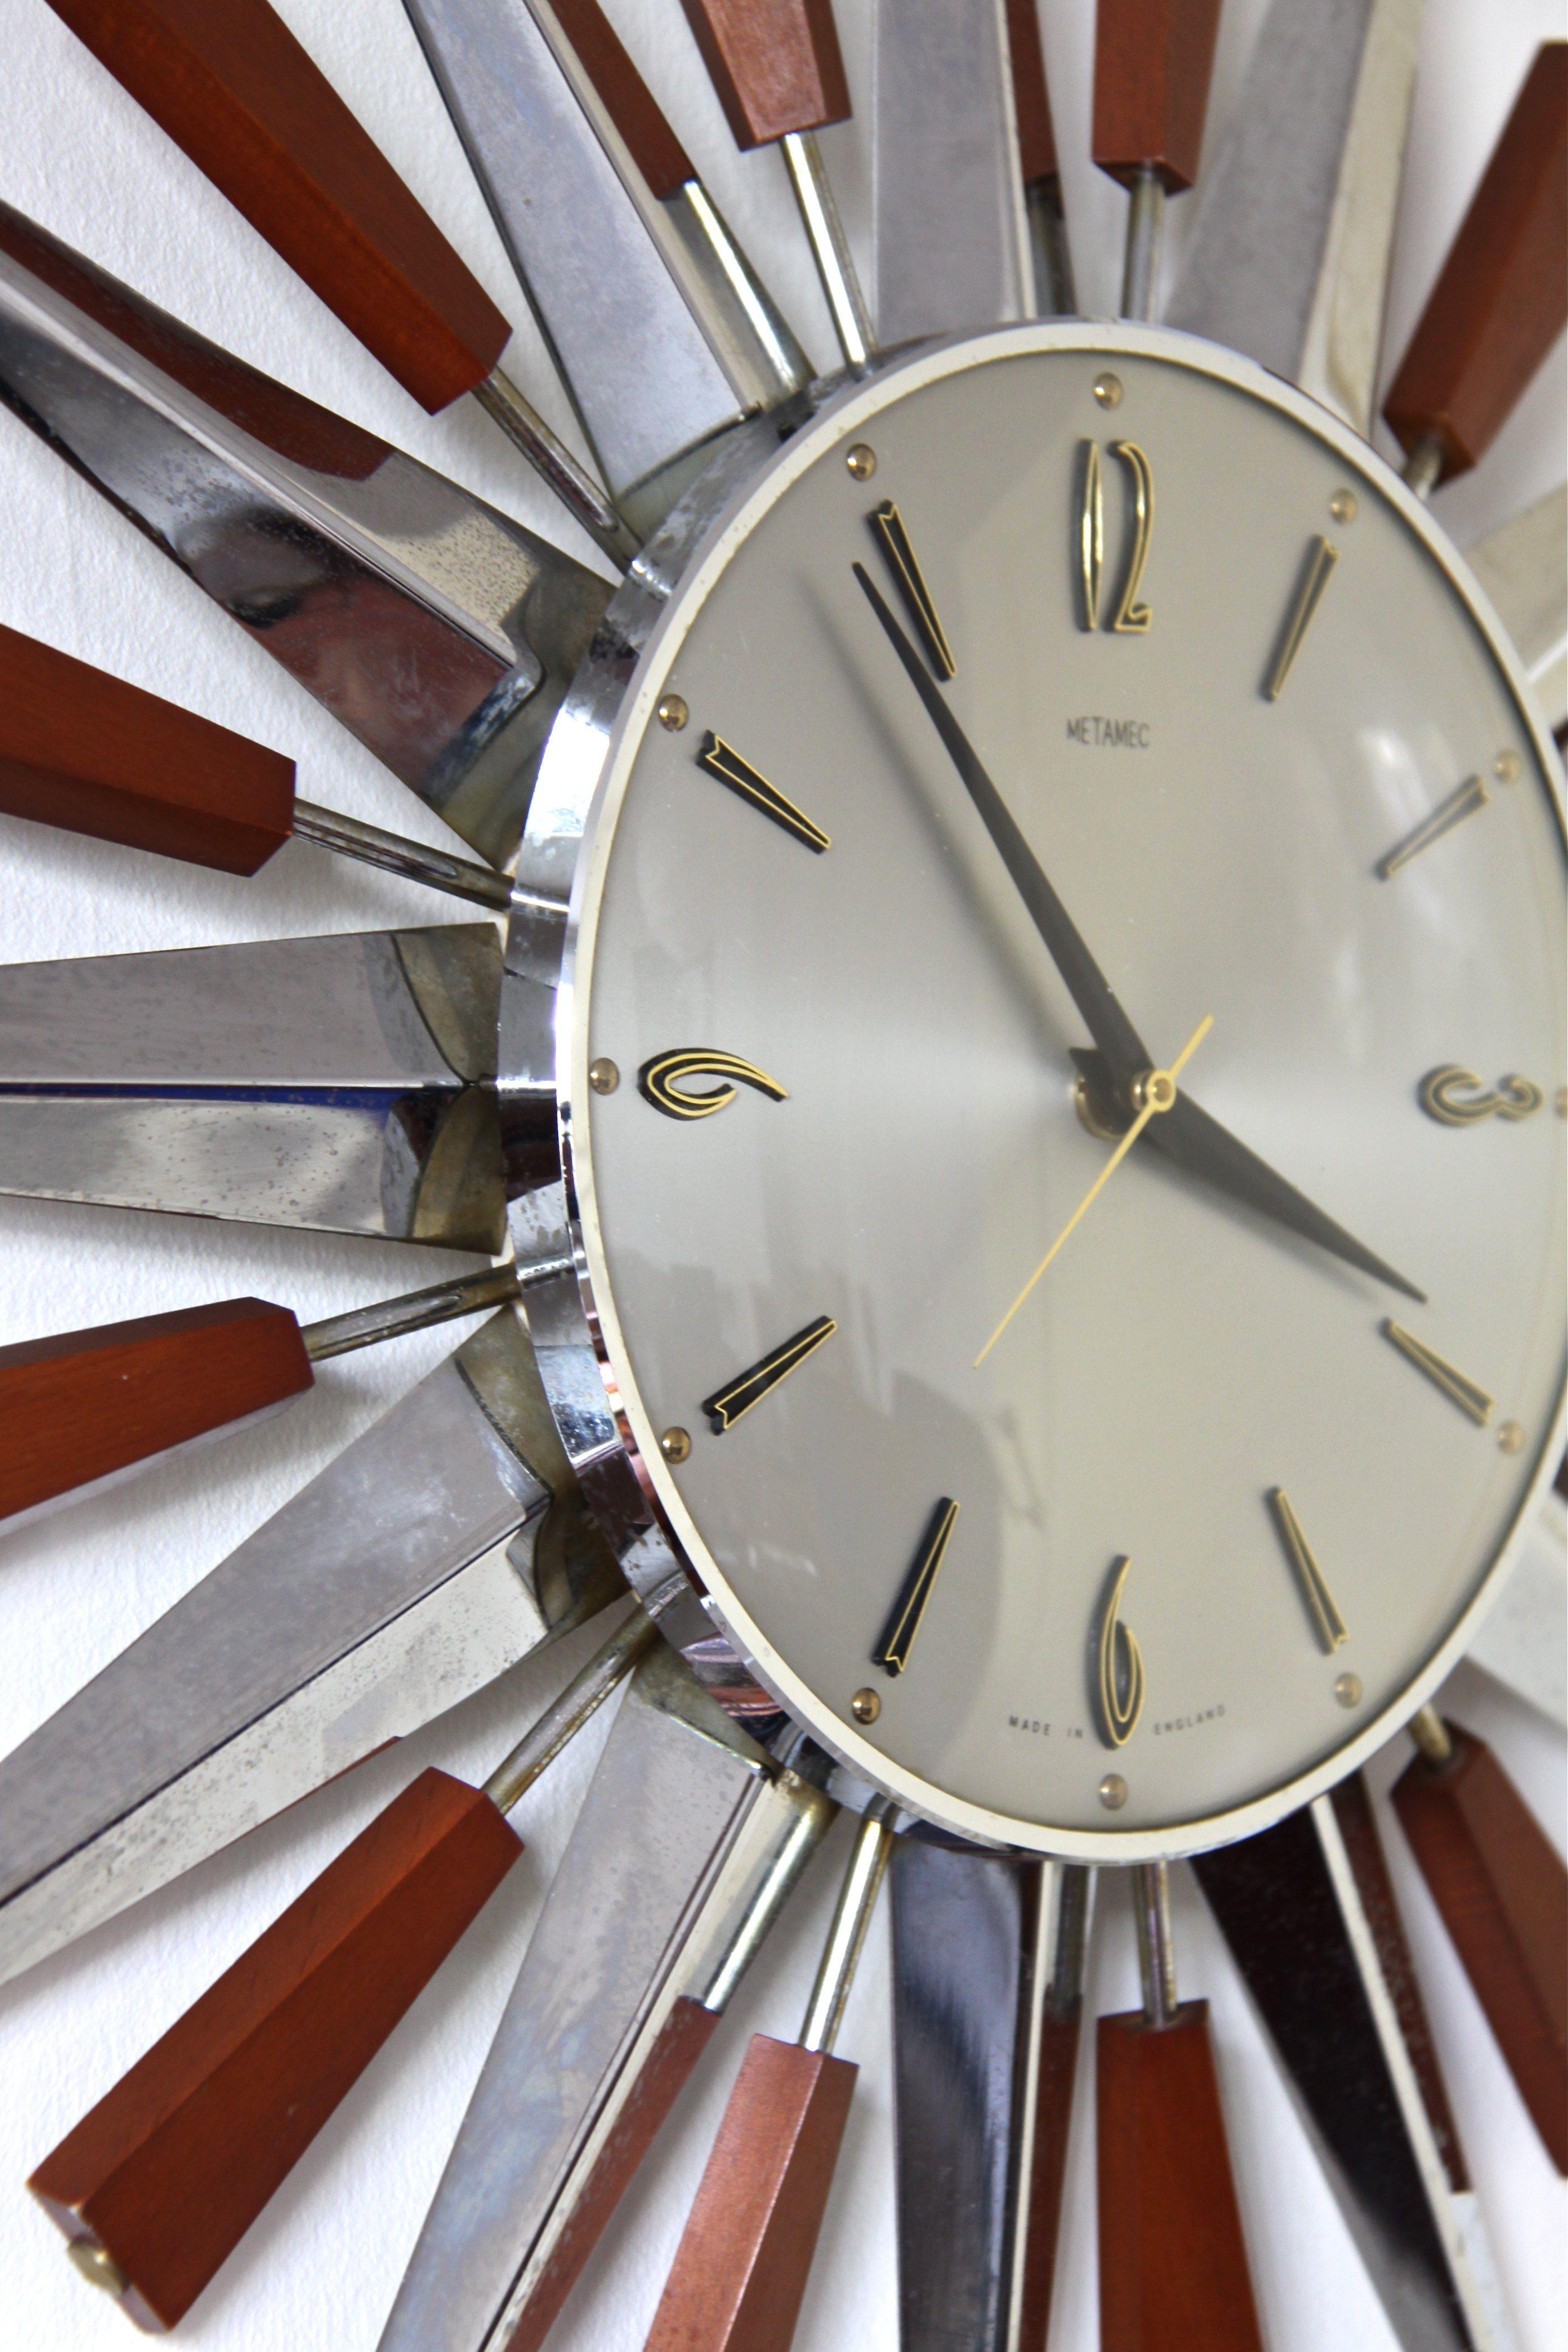 1960s sunburst clock metamec starburst wall clock circa 1960u0027s